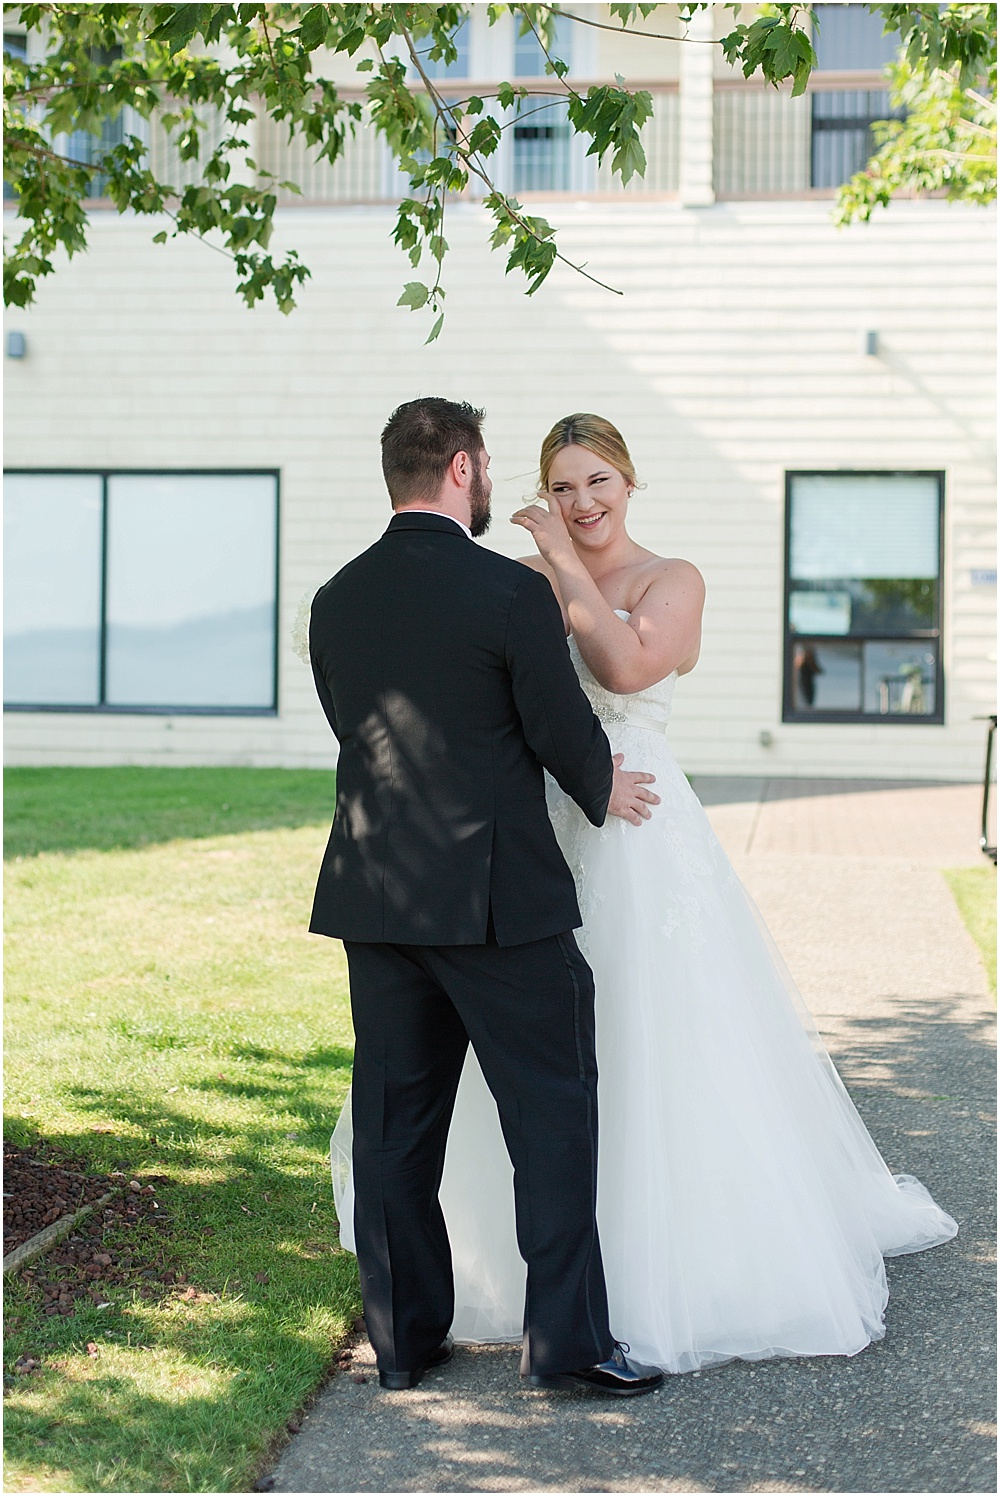 mitzner_silverdale_beach_hotel_wedding_silverdale_washington_pacific_northwest_wedding_photographer_0018